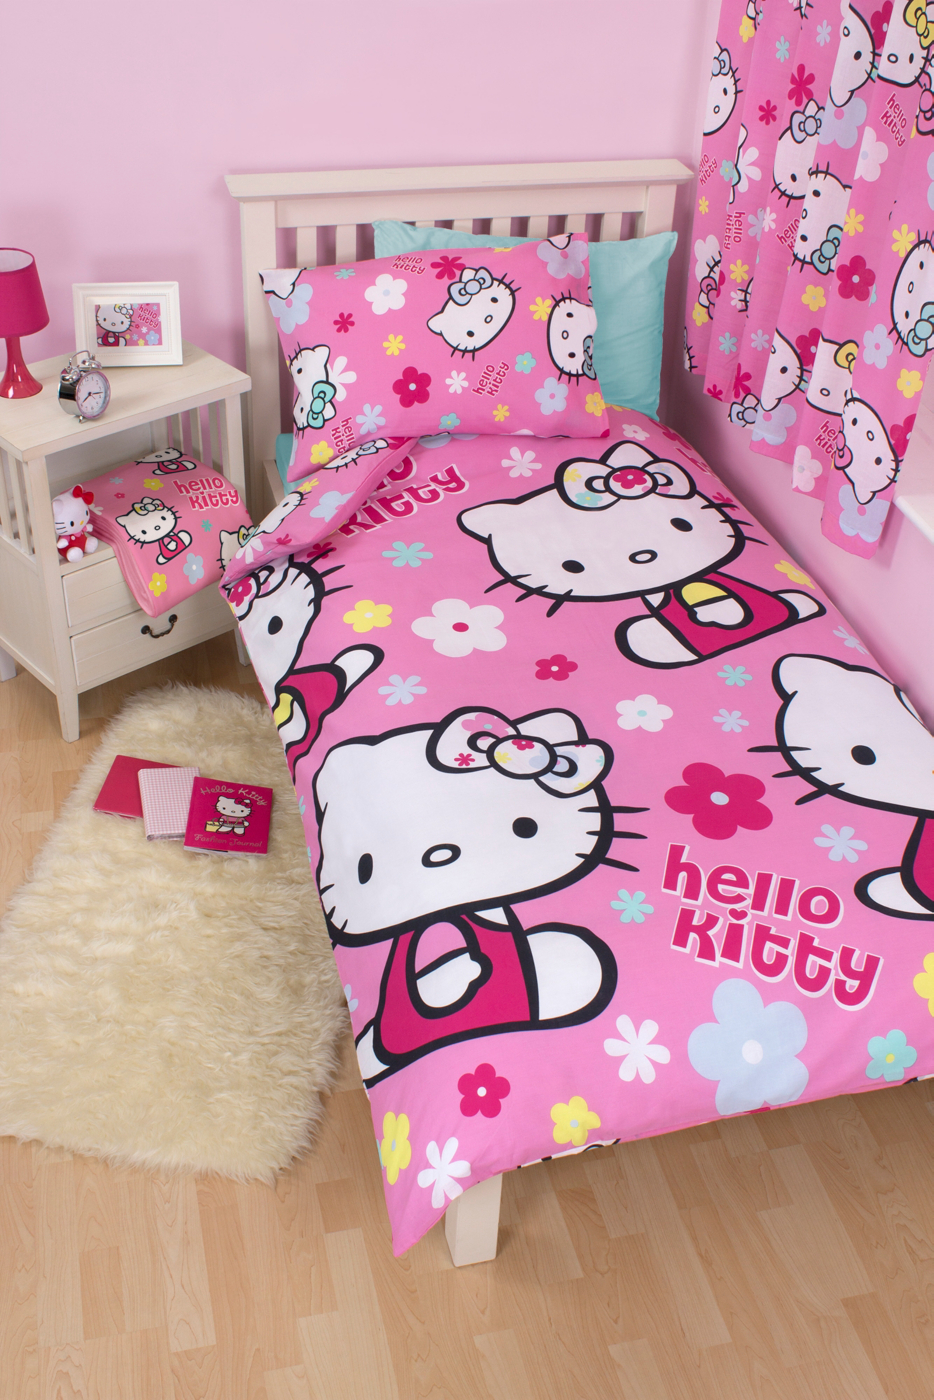 Hello Kitty Bedroom Range Kids Beds